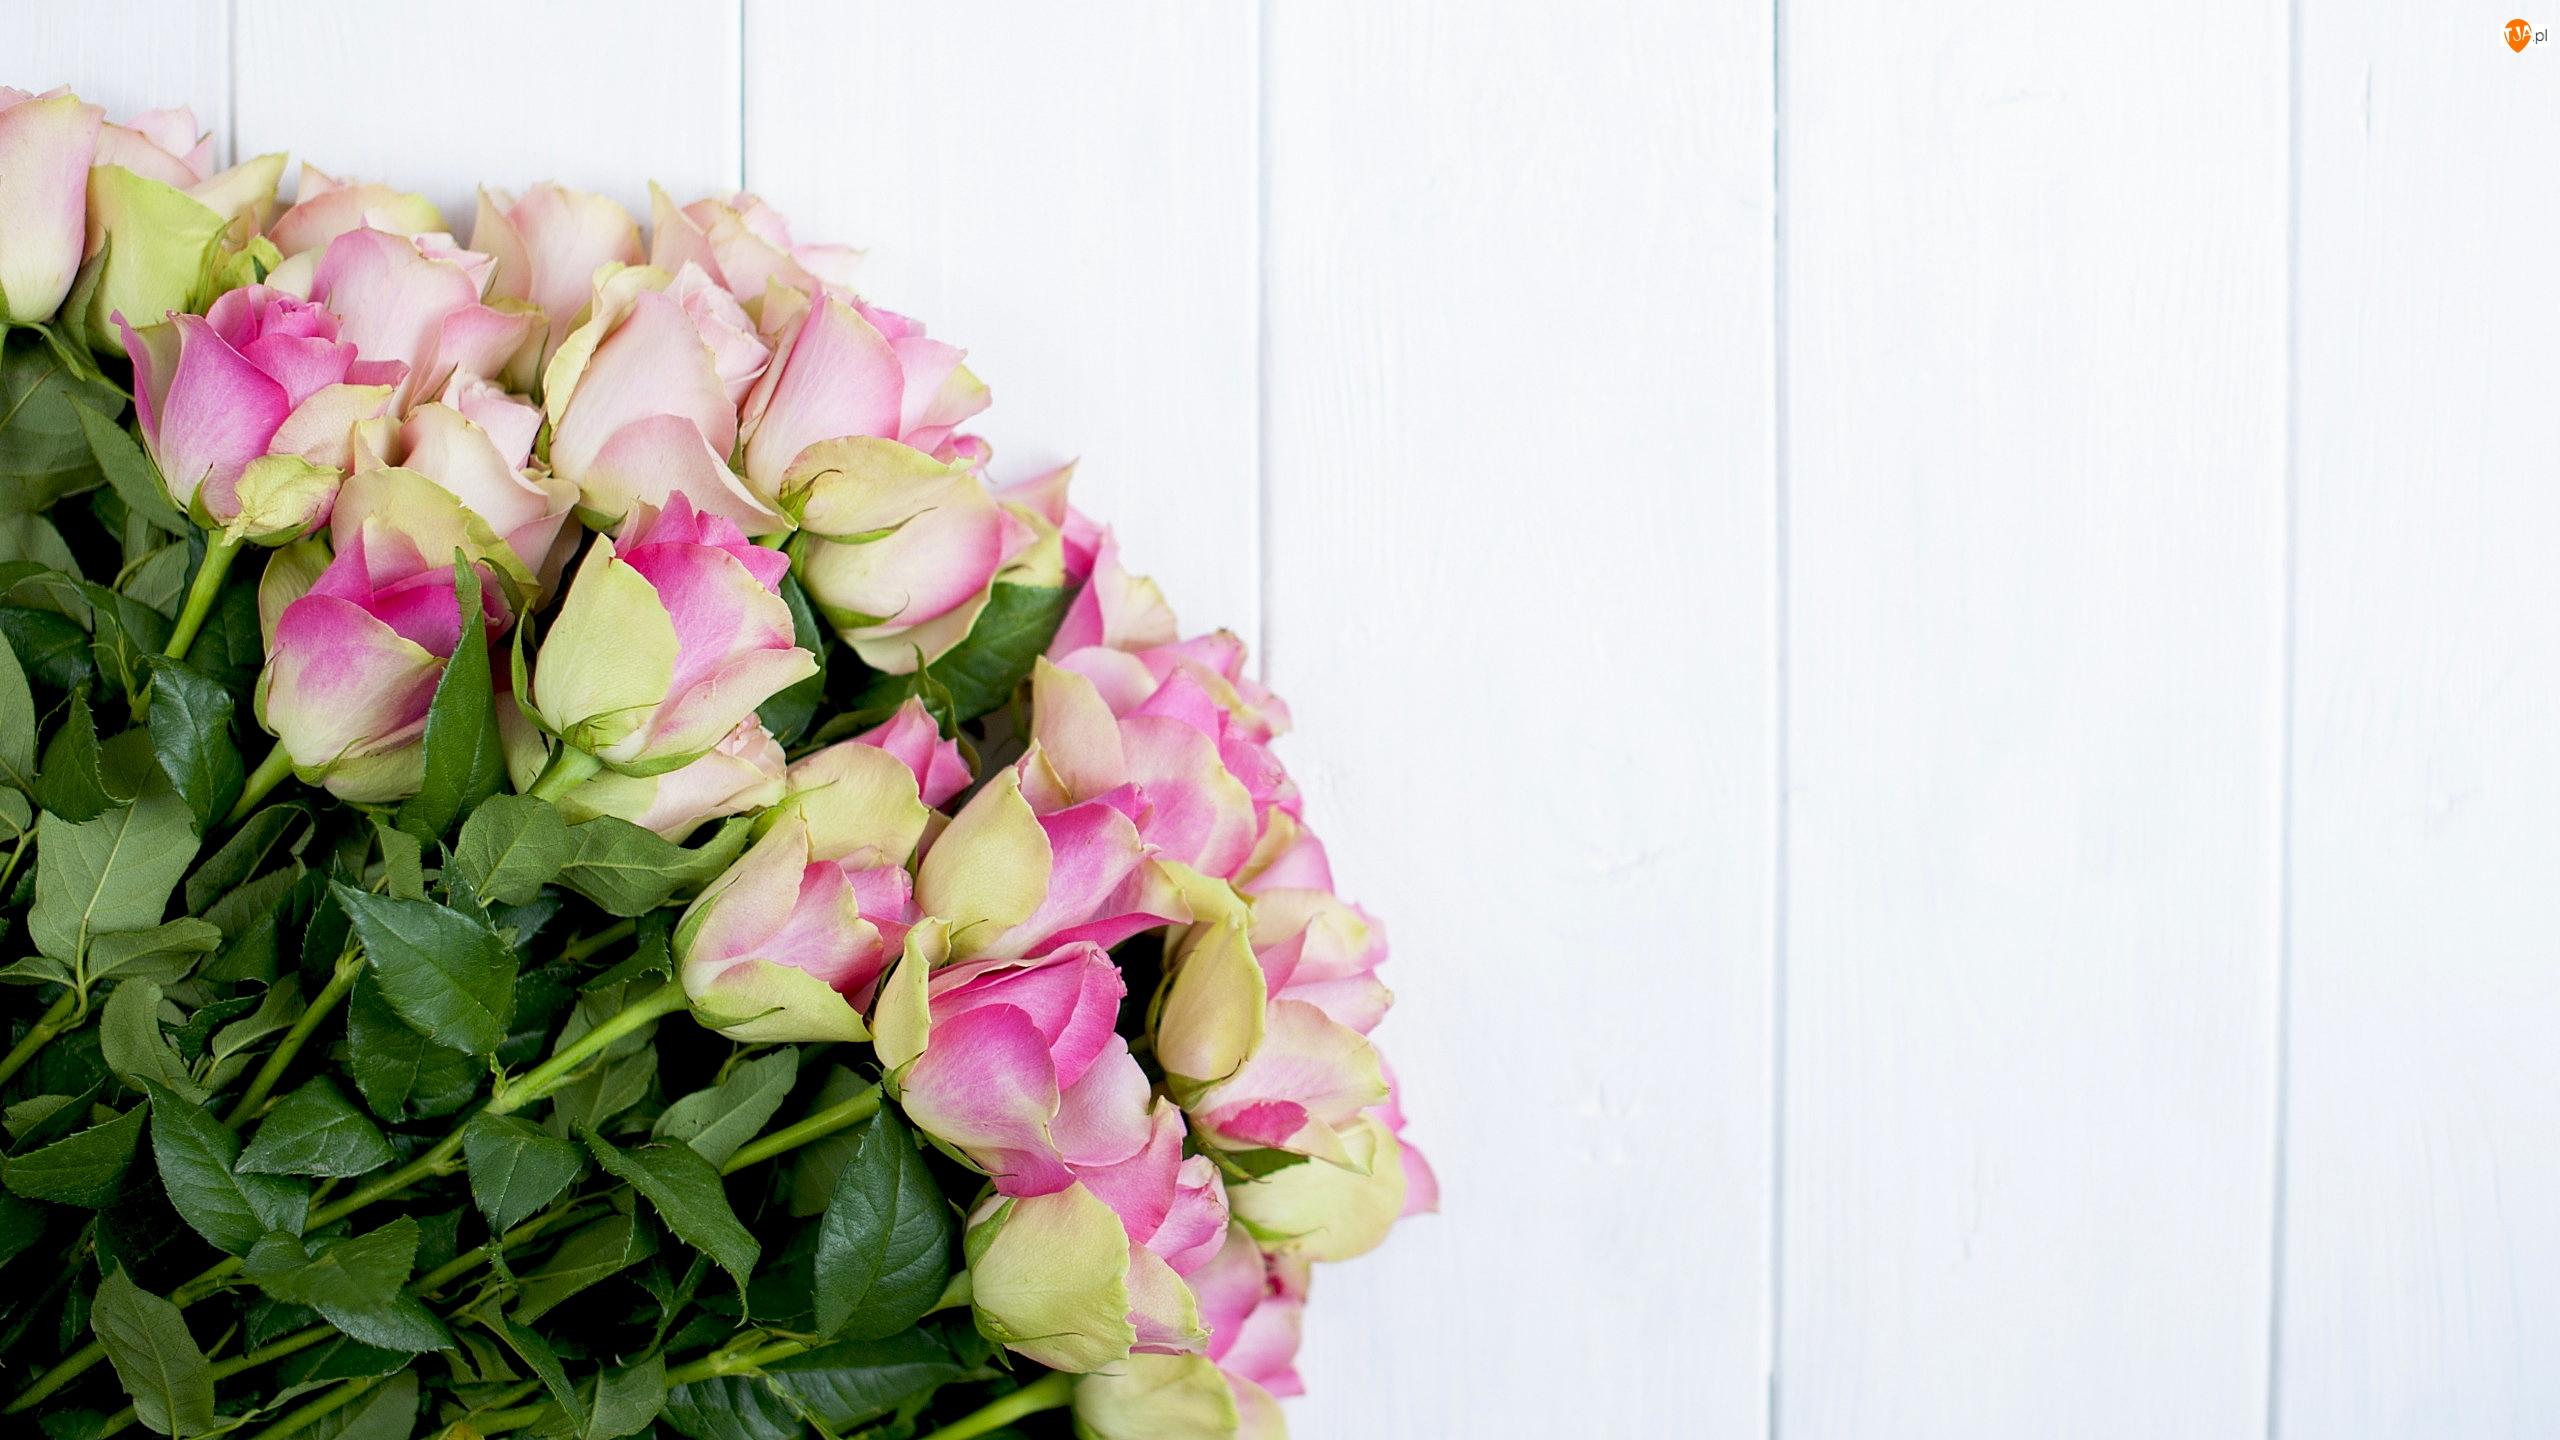 Deski, Żółto-różowe, Róże